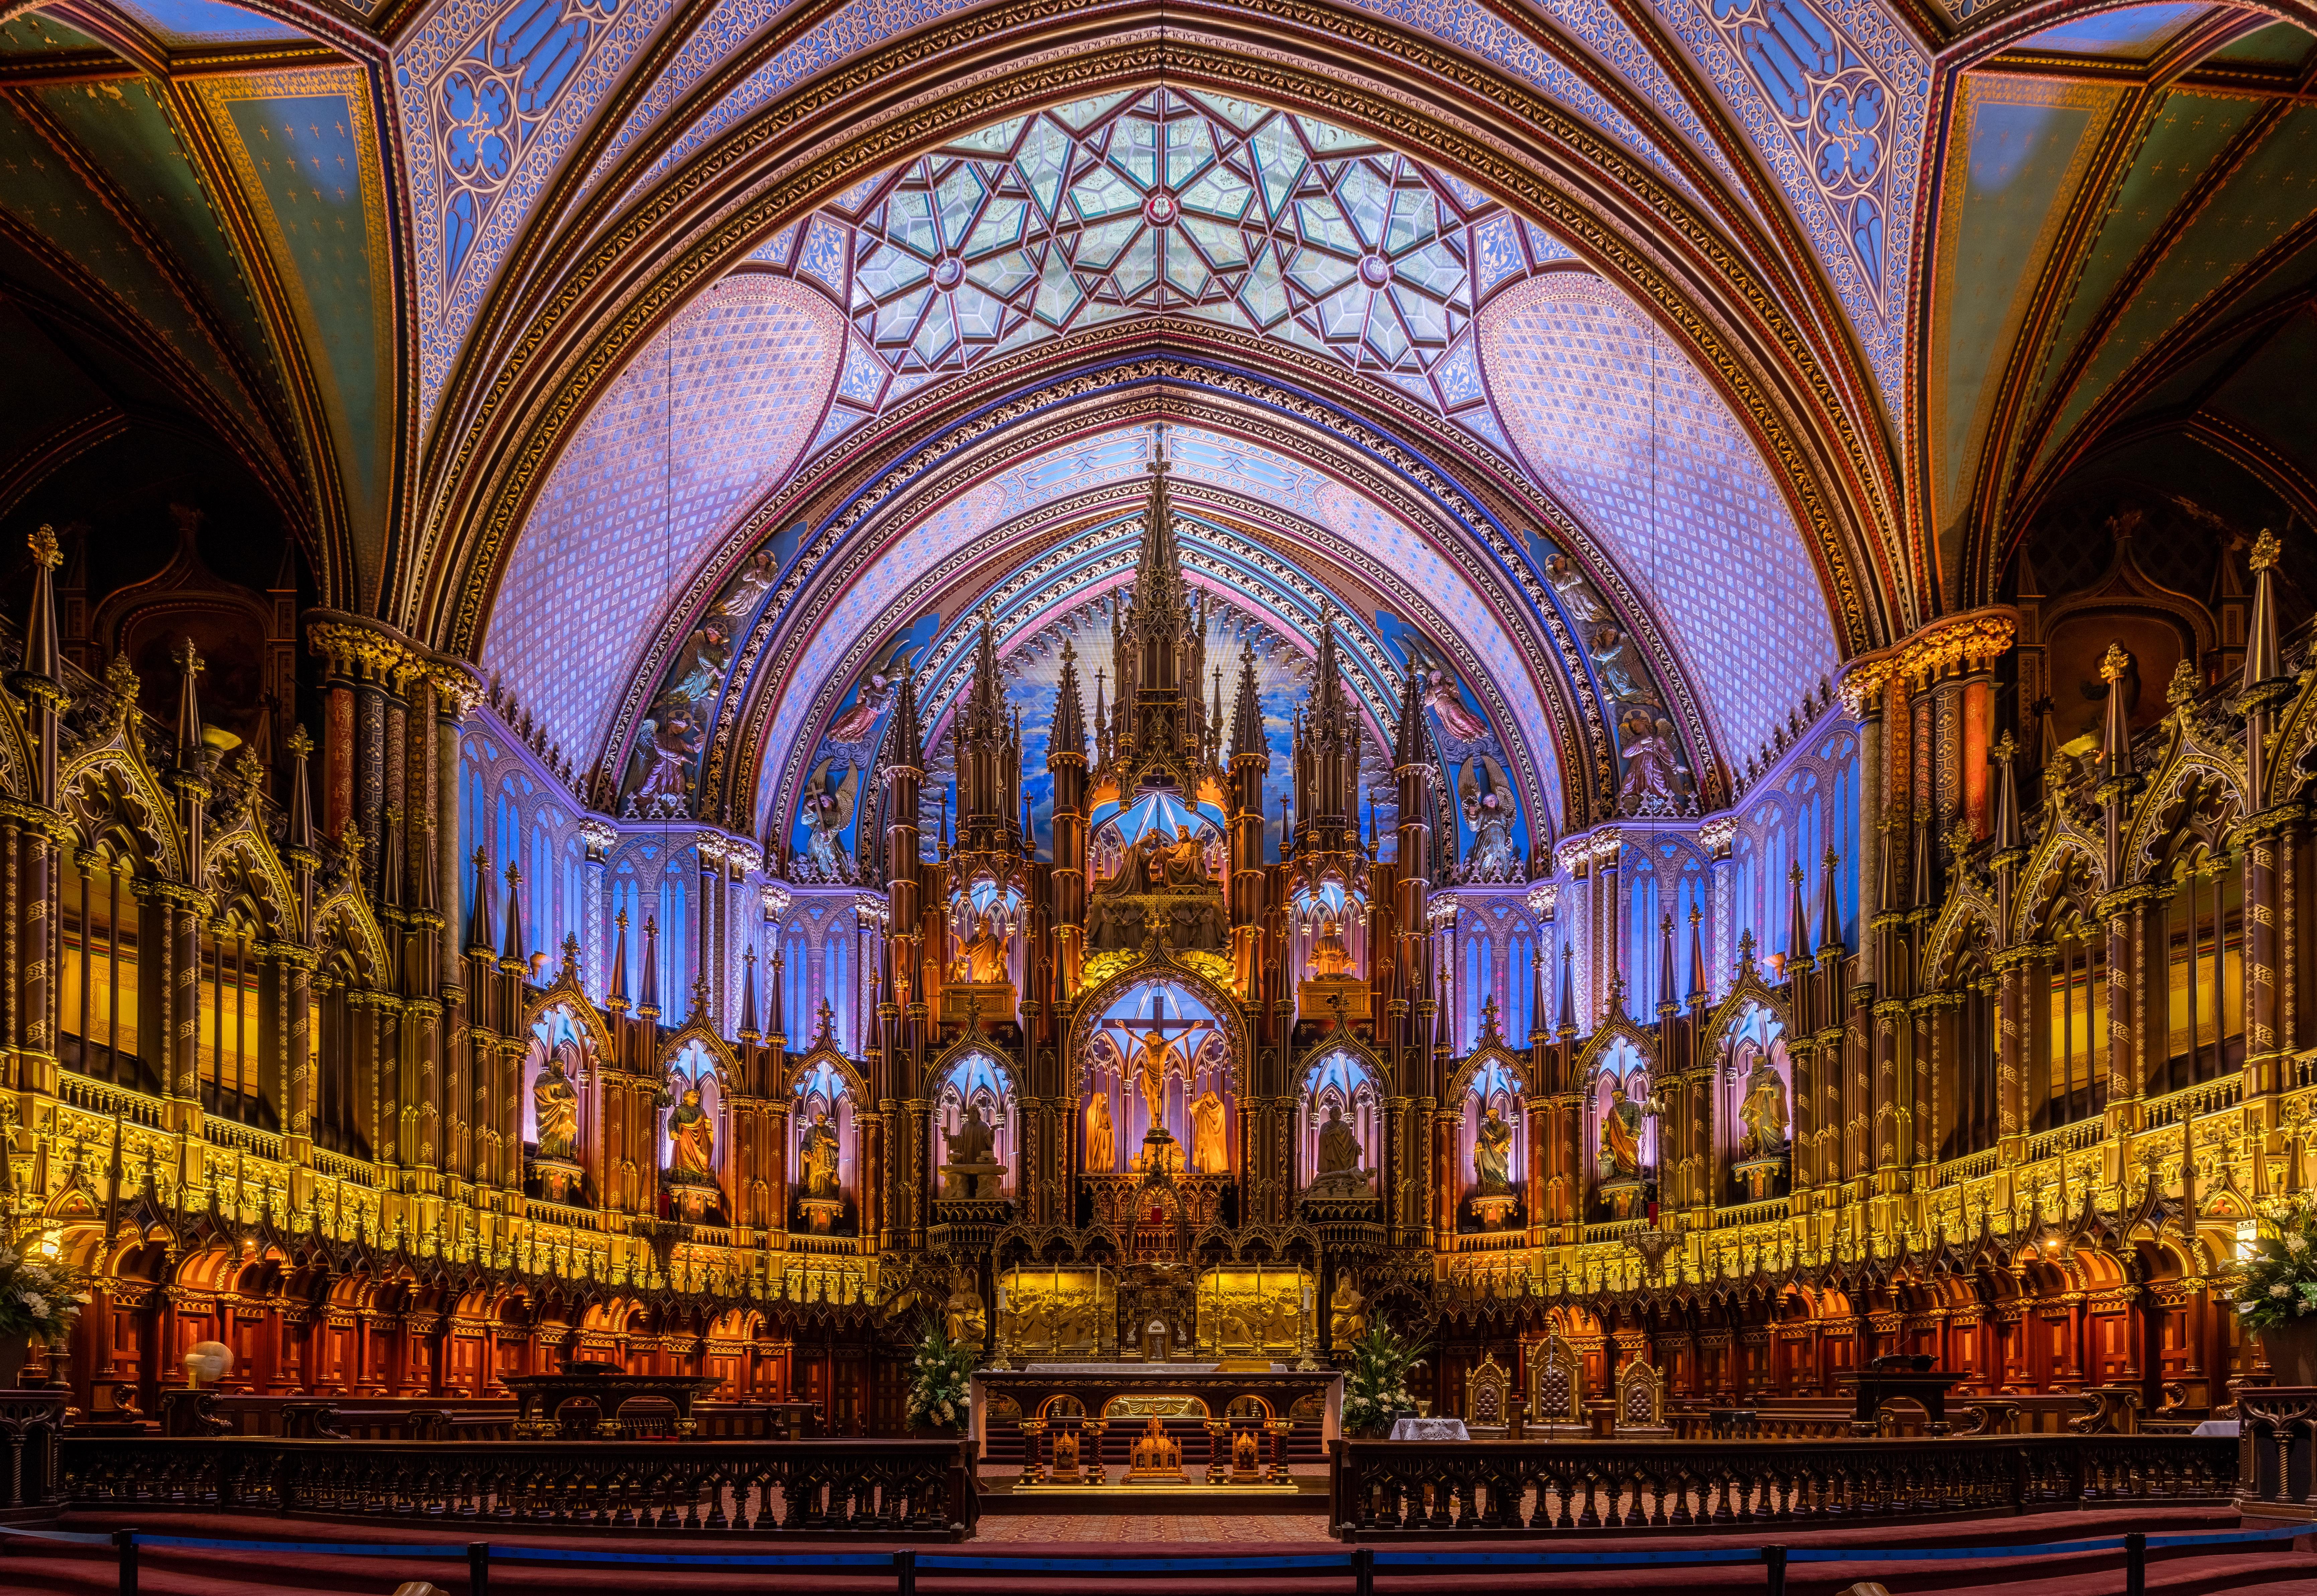 Basílica de Notre-Dame, Montreal, Canadá, 2017-08-12, DD 25-27 HDR.jpg